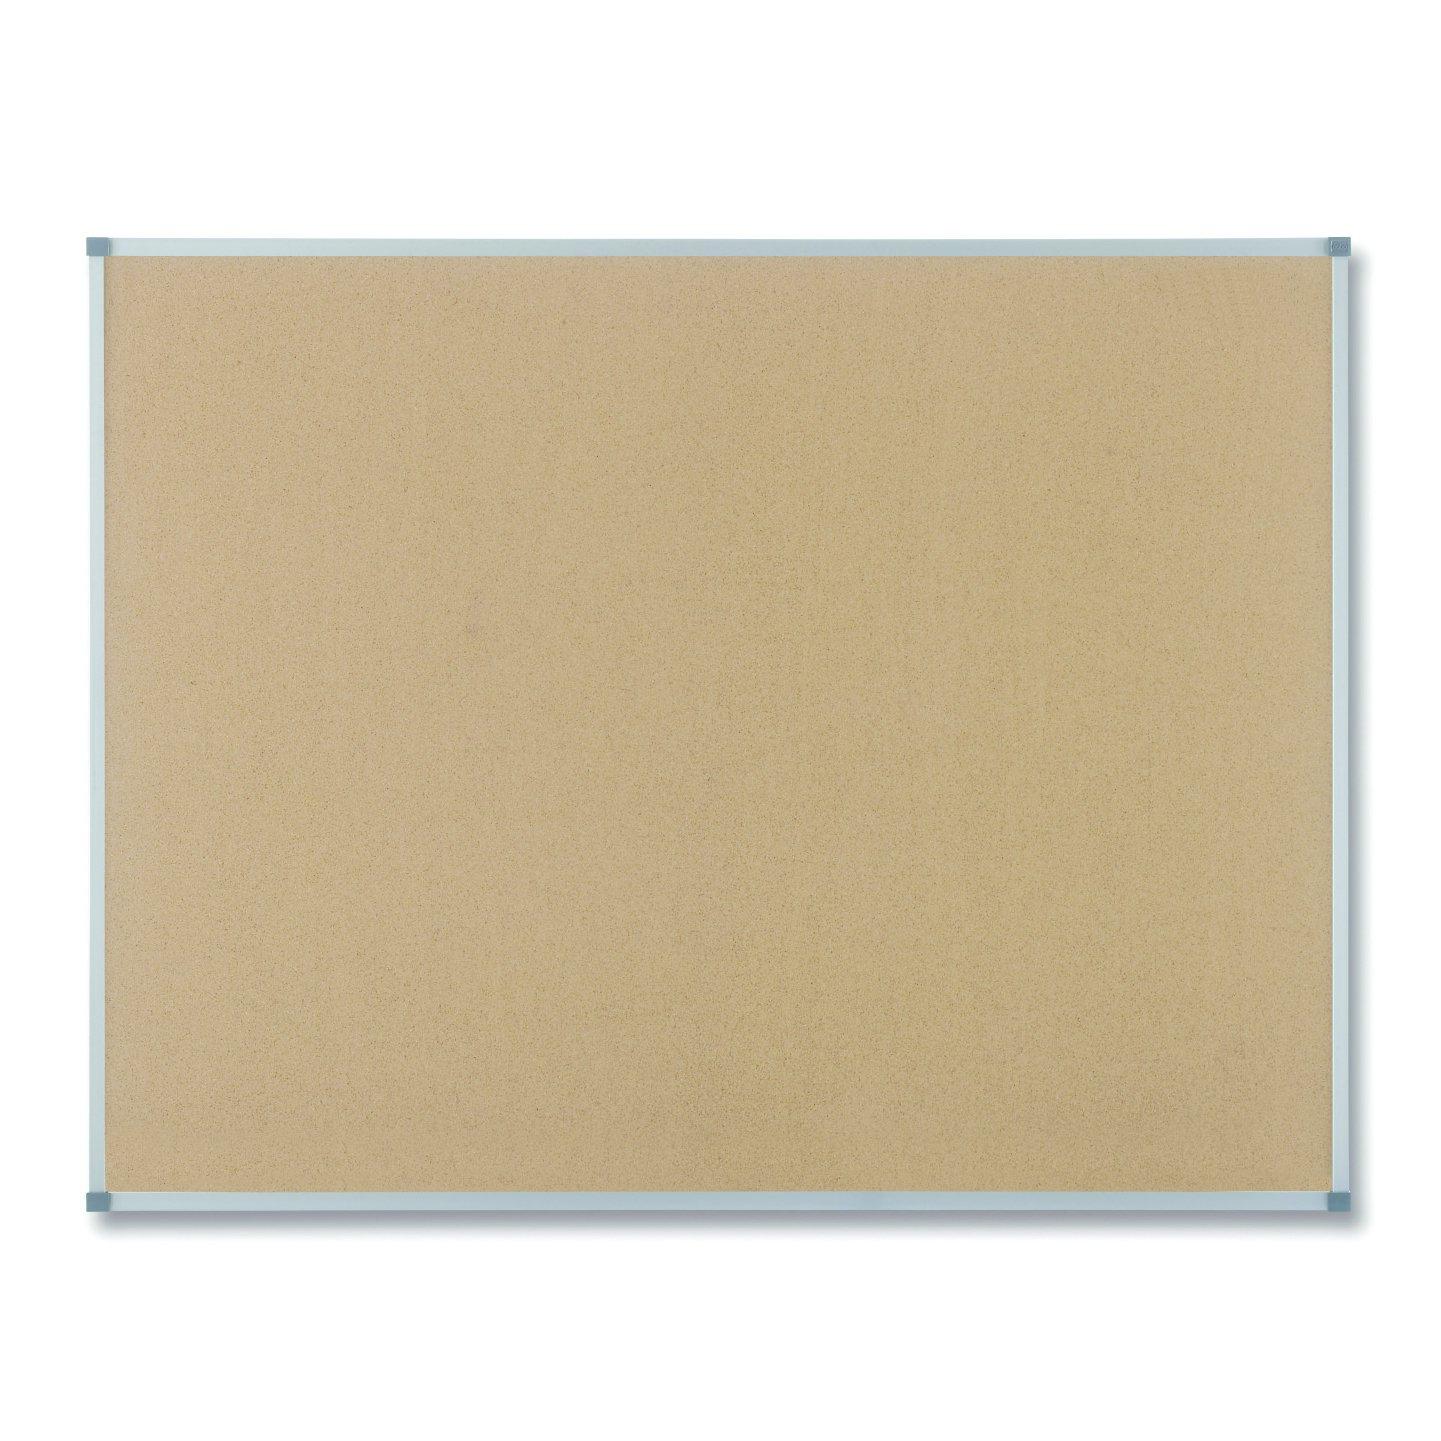 Nobo Basic Aluminium Trim Cork Noticeboard 1200x900mm 1904064